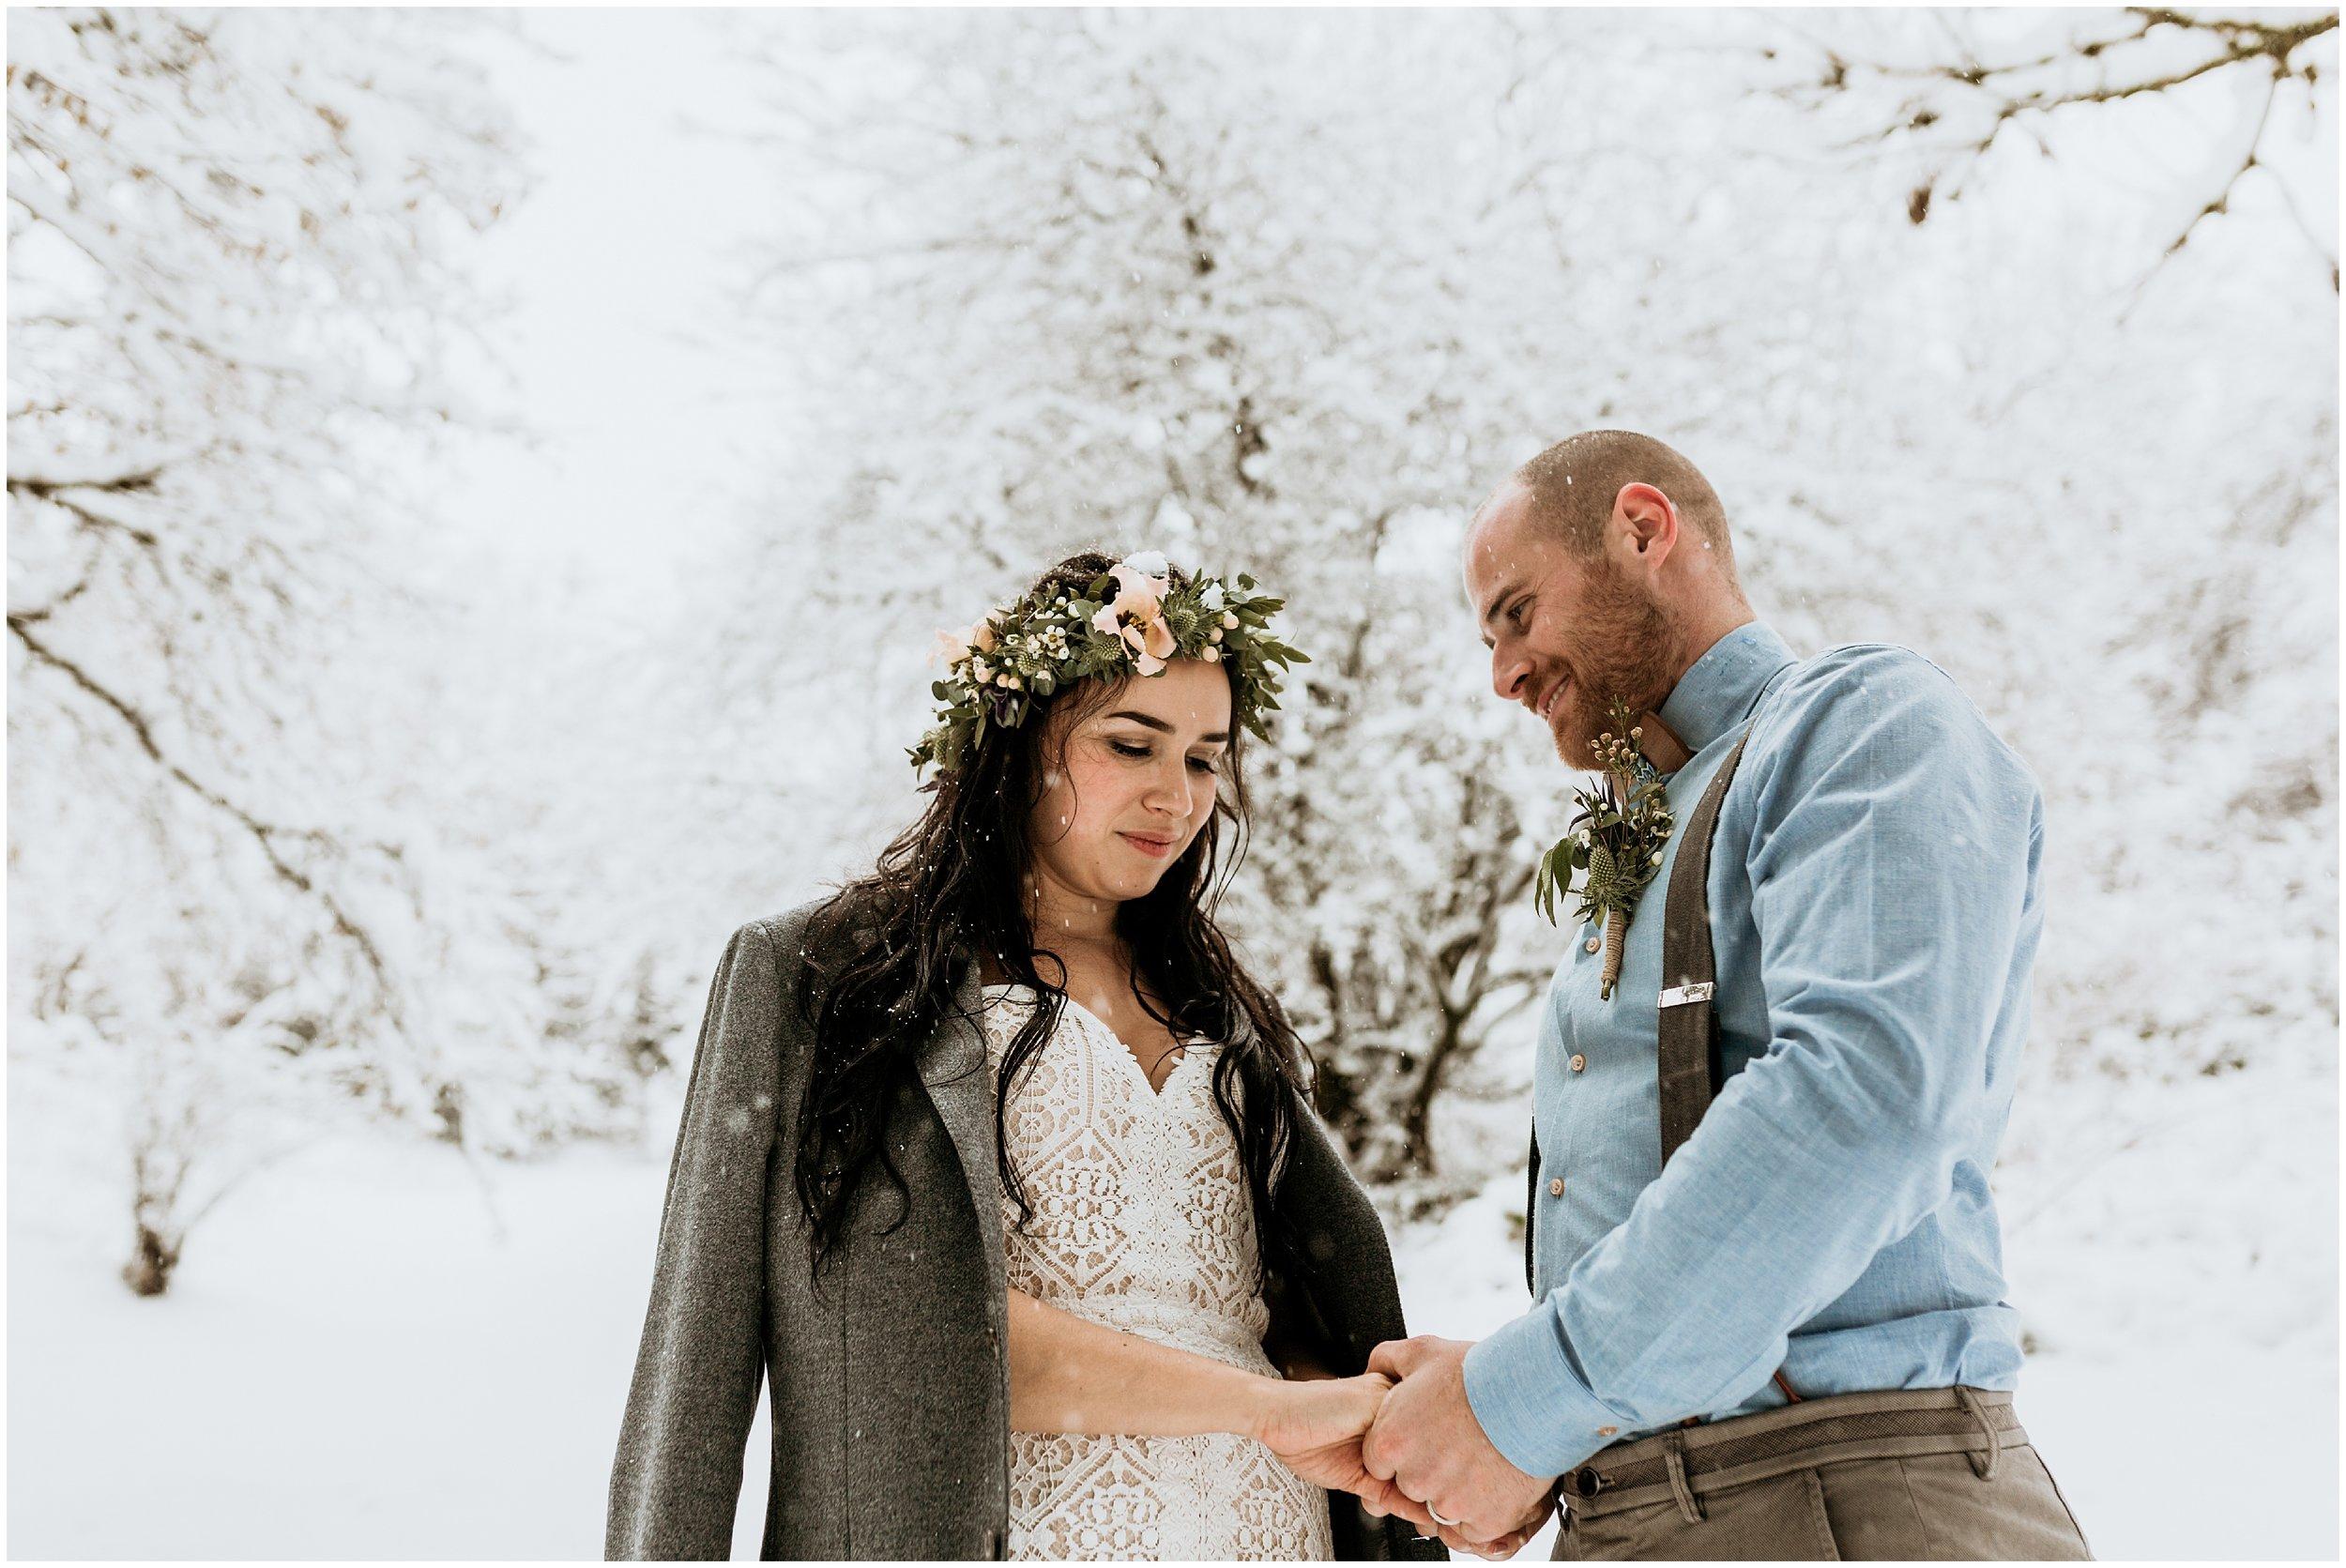 huwelijksfotografie-jana-joeri-ardennen-sechery_0025.jpg